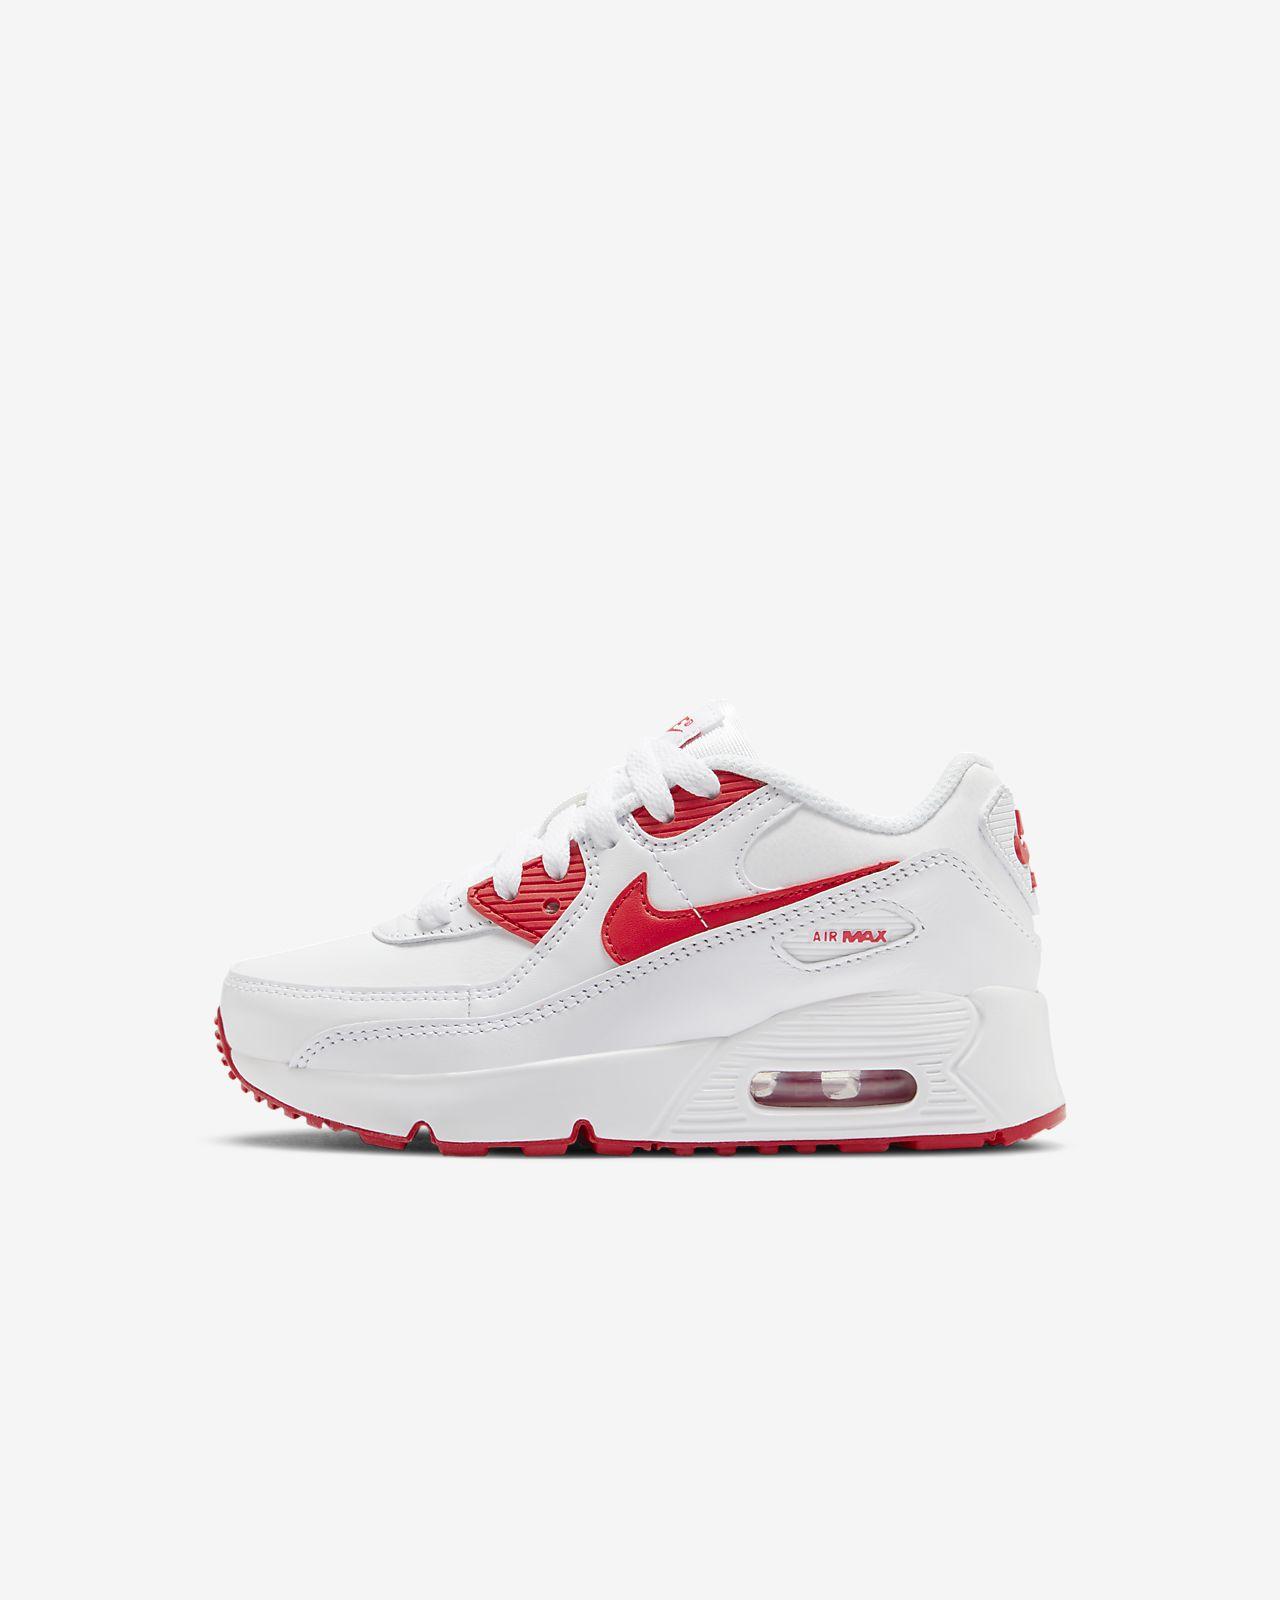 Nike Air Max 90 Zapatillas - Niño/a pequeño/a